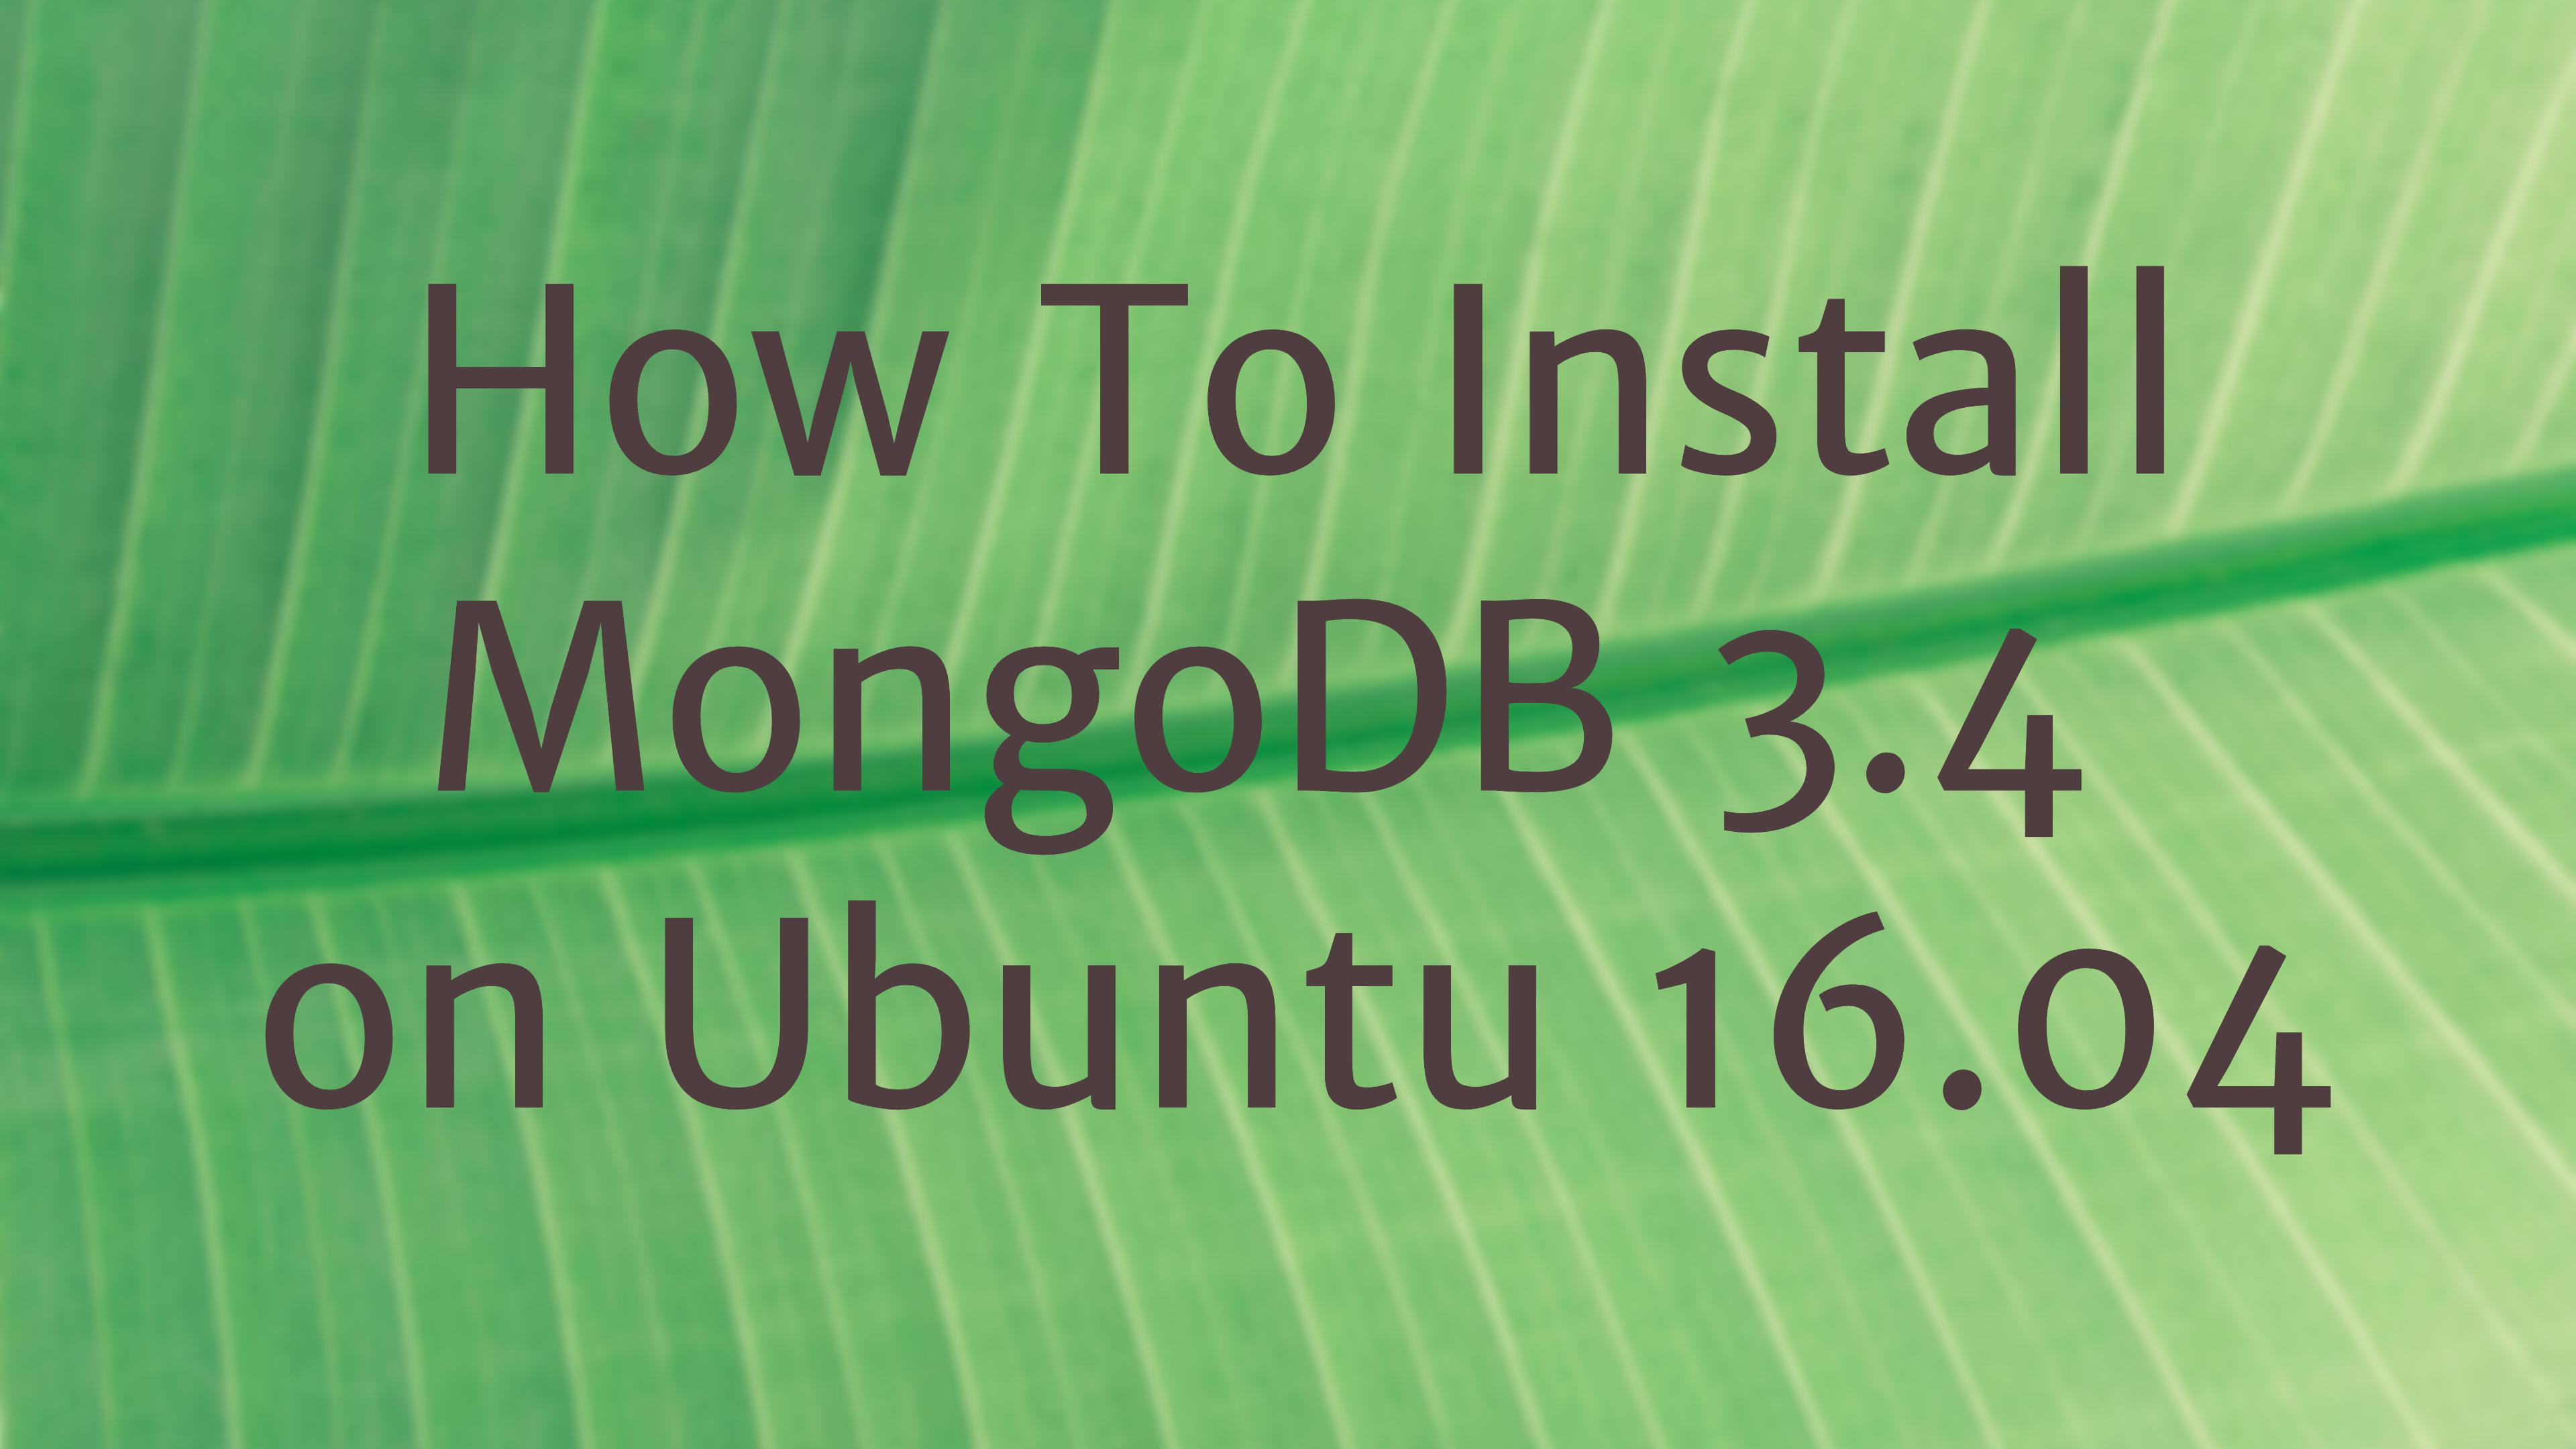 Install MongoDB 3.4 ubuntu 16.04